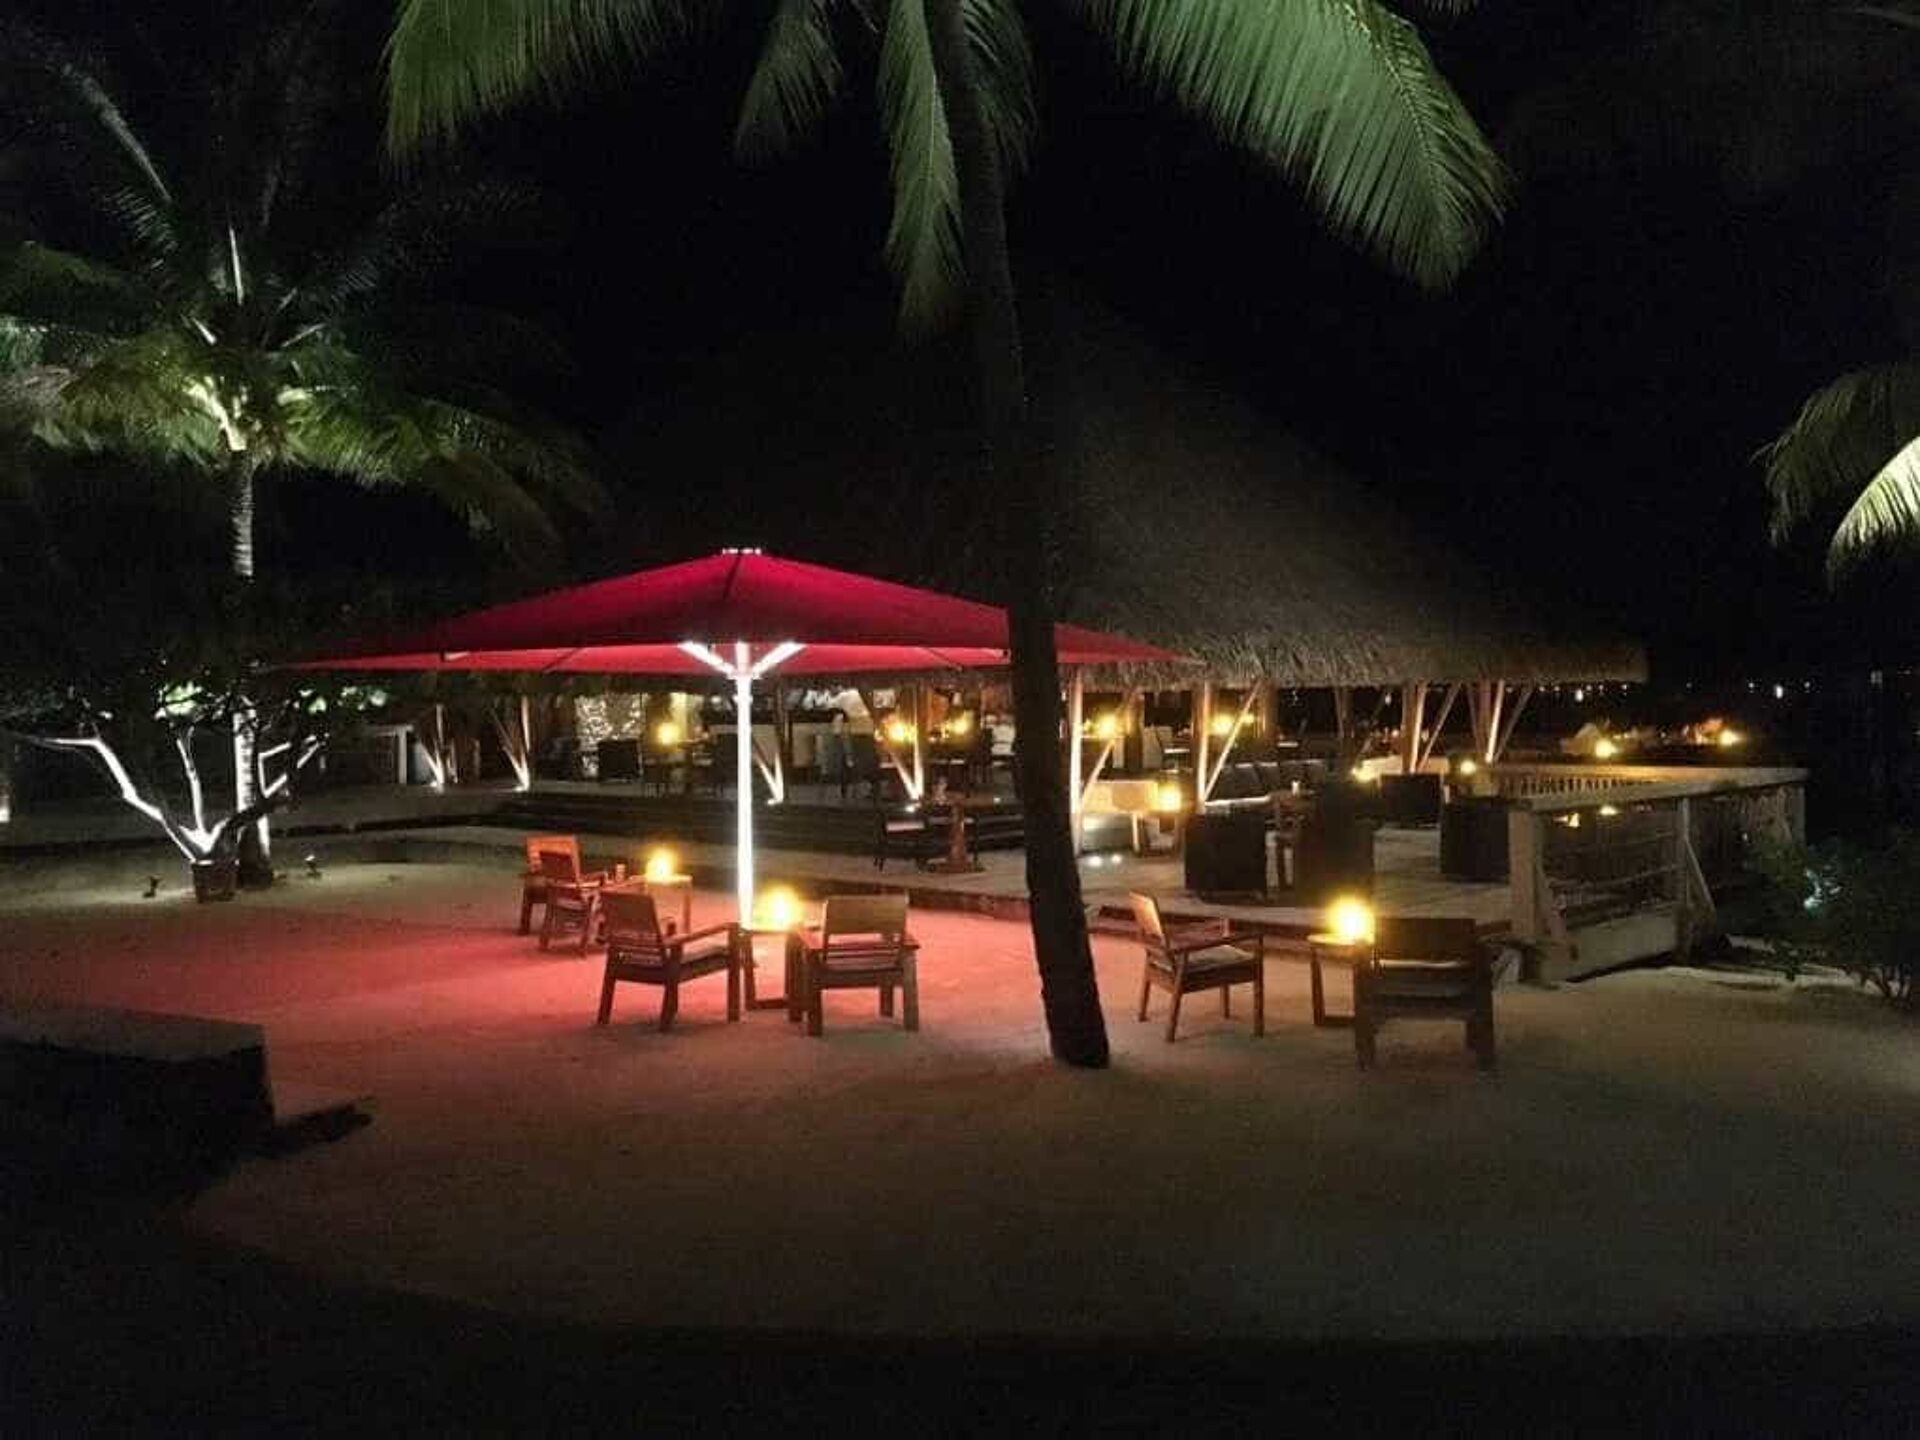 Four Seasons Resort Bora Bora Shade7 Tempest Commercial Umbrella